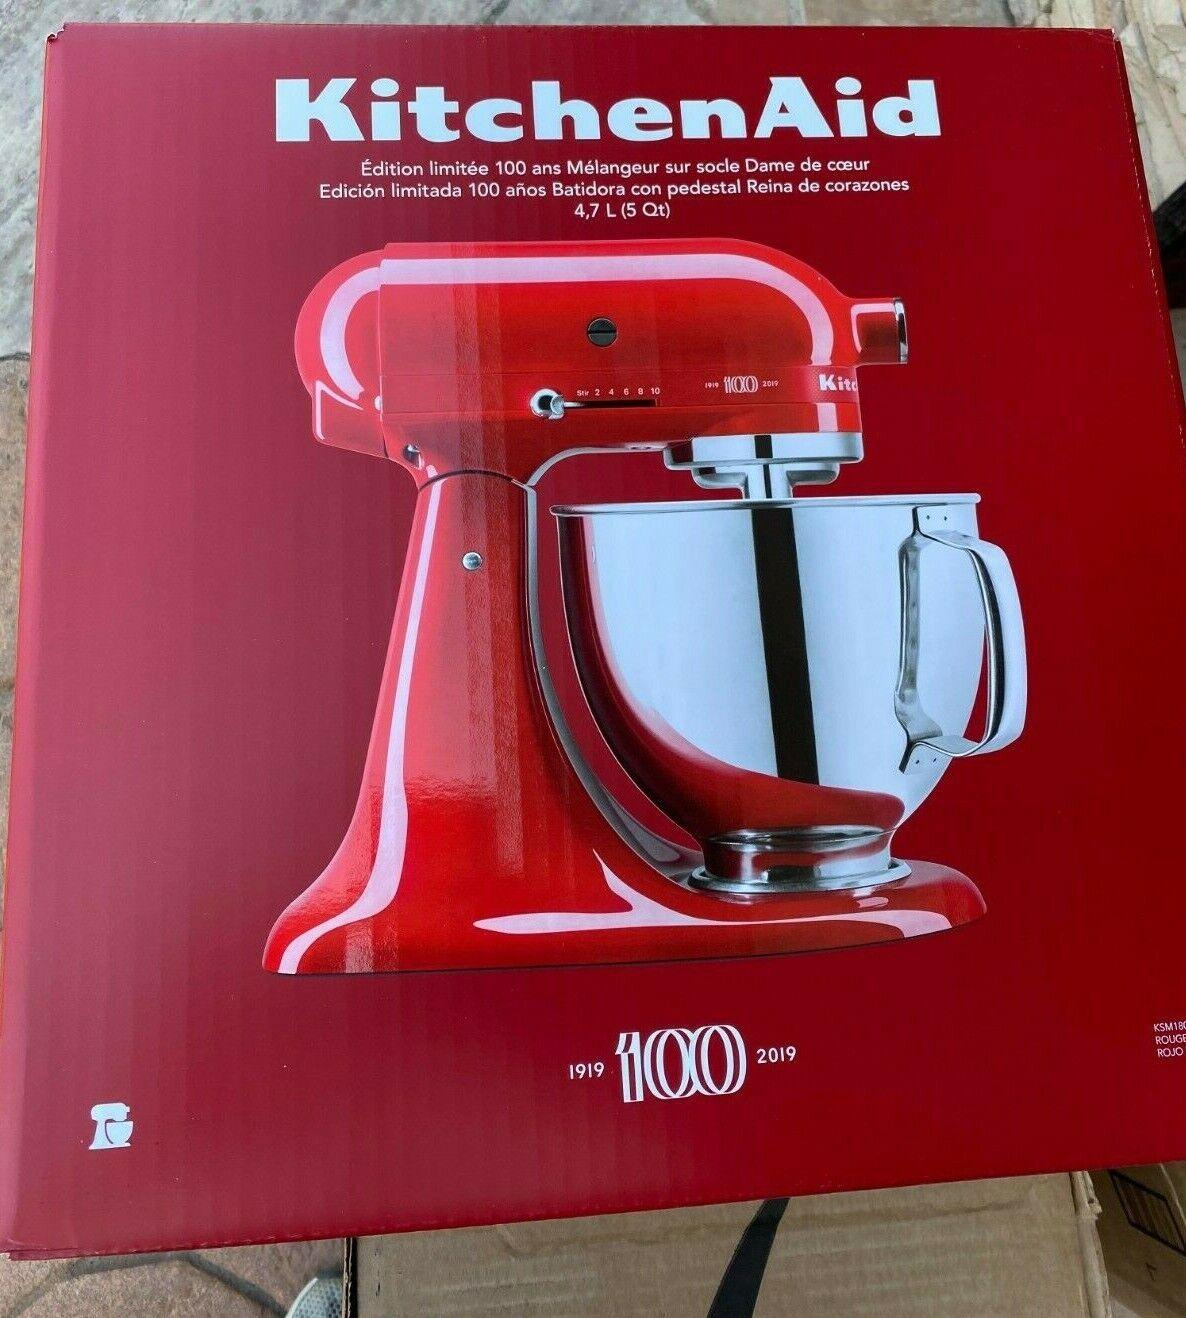 KitchenAid KSM180QHSD 100 Year Limited Edition Queen of Hear